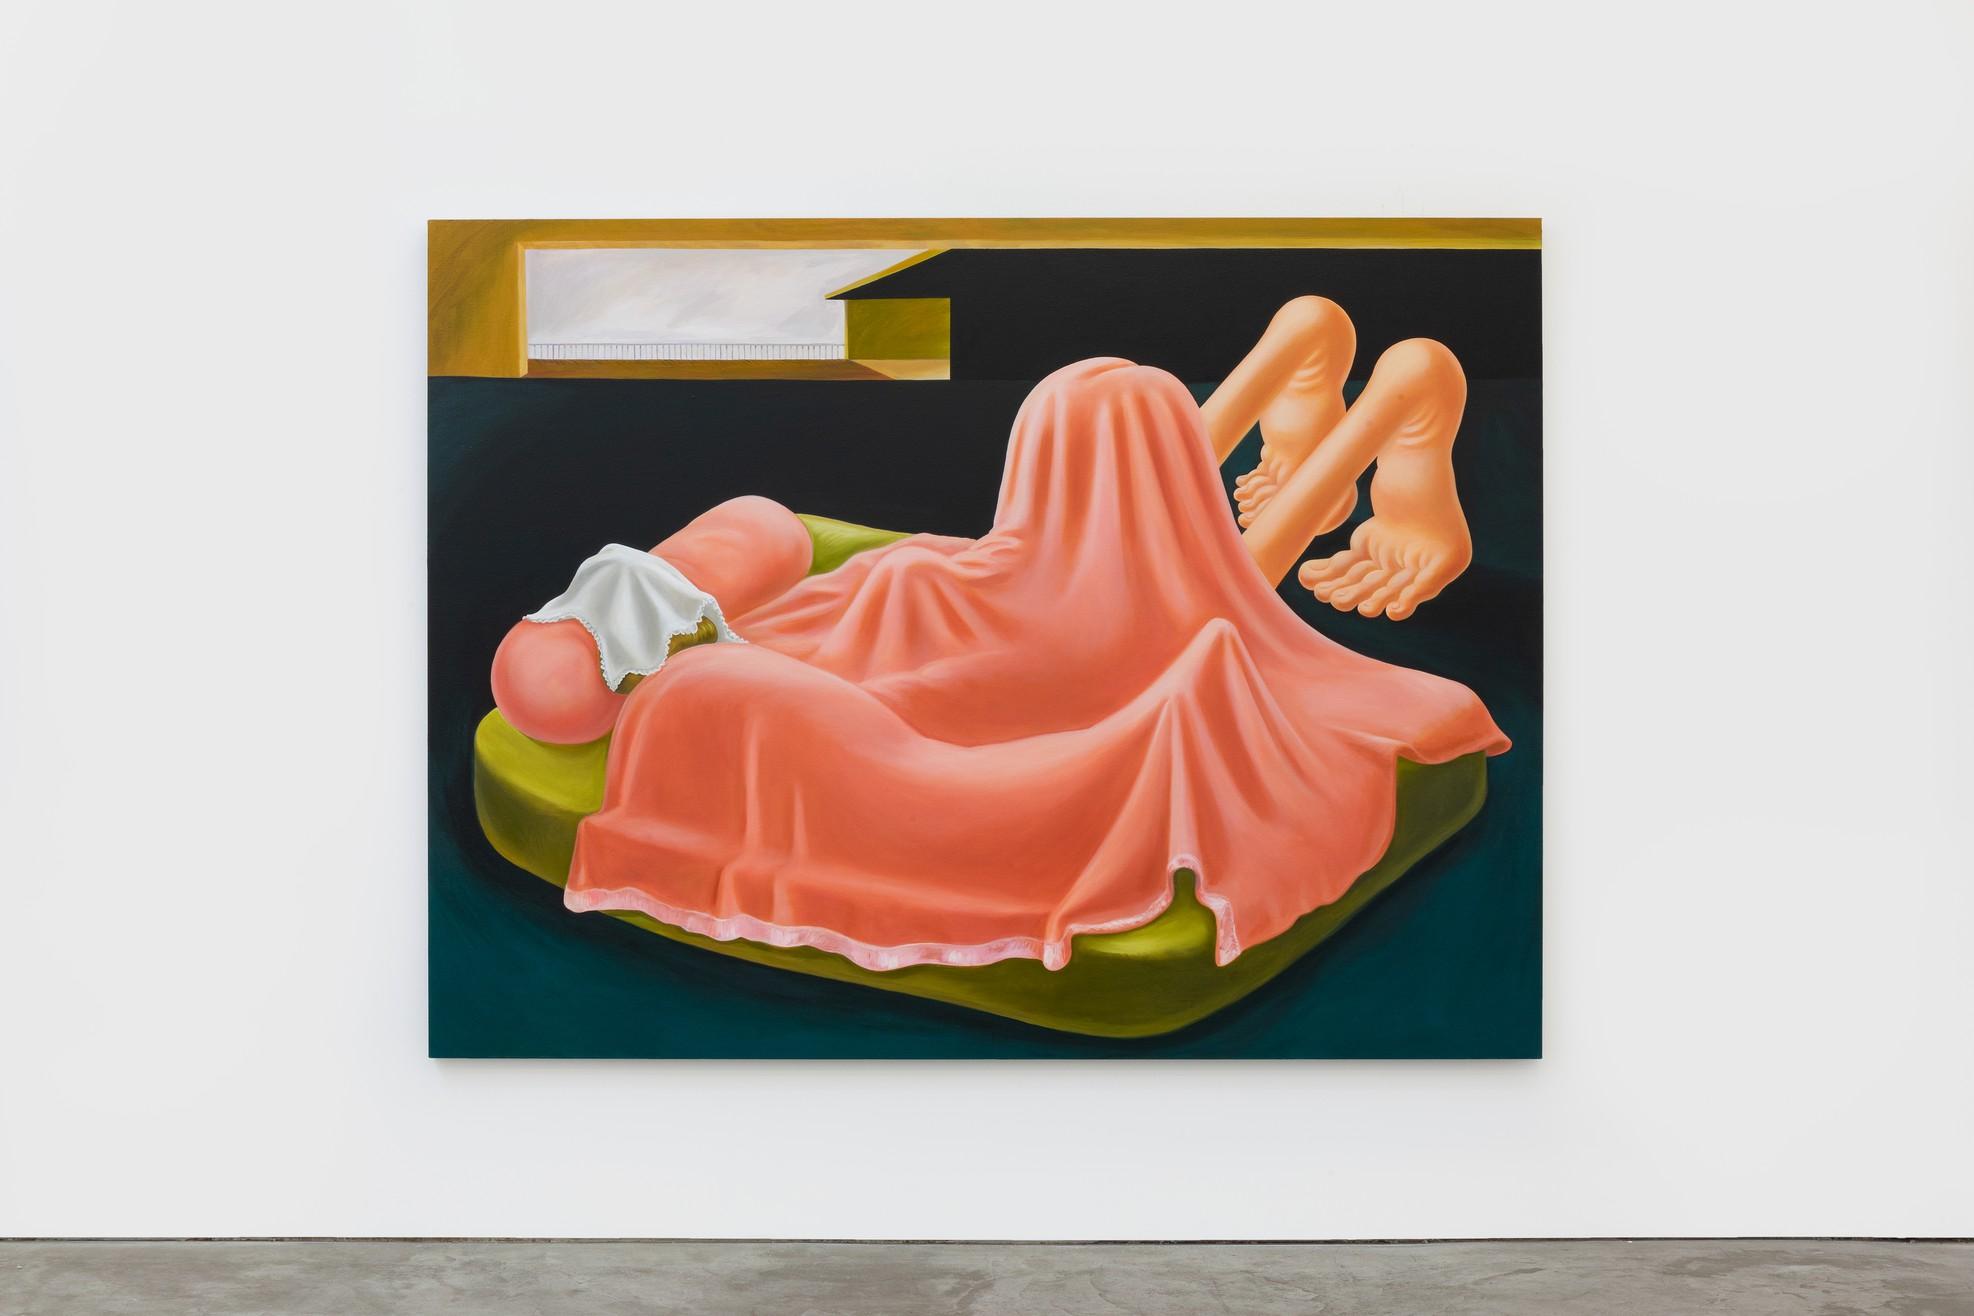 Louise Bonnet, Interior with Pink Blanket, 2019 Oil on linen, 72 × 96 inches (182.9 × 243.8 cm)© Louise Bonnet